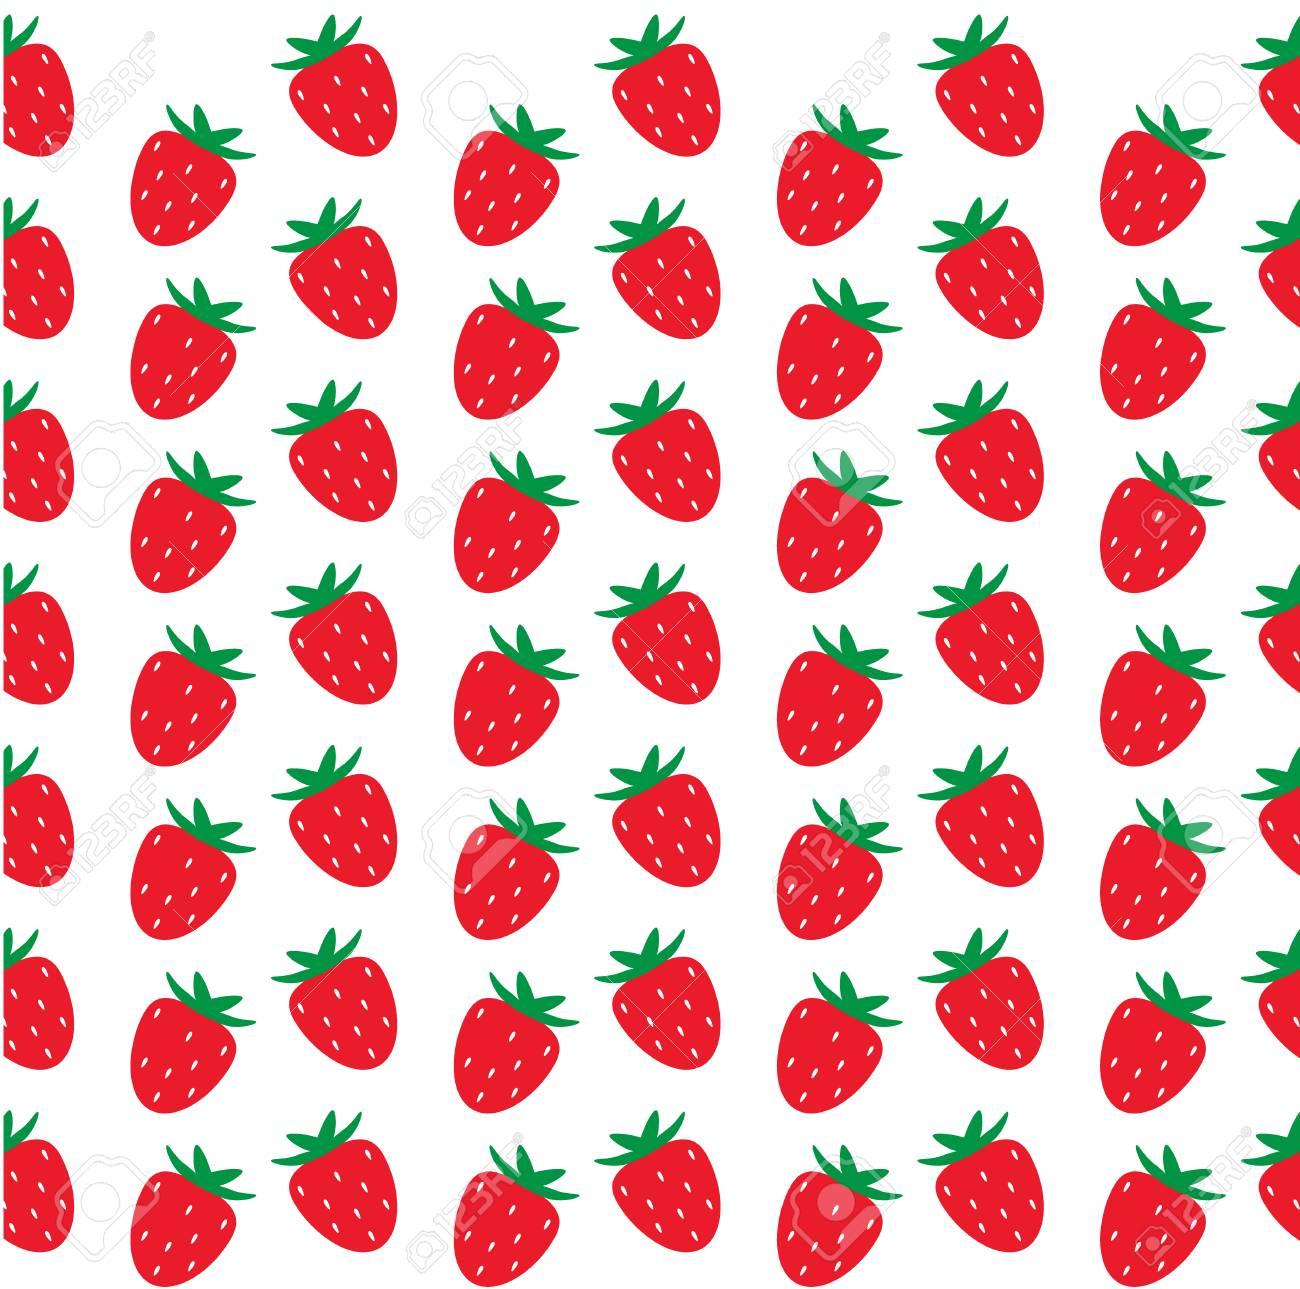 Seamless Strawberry Pattern On White Background Strawberry Background